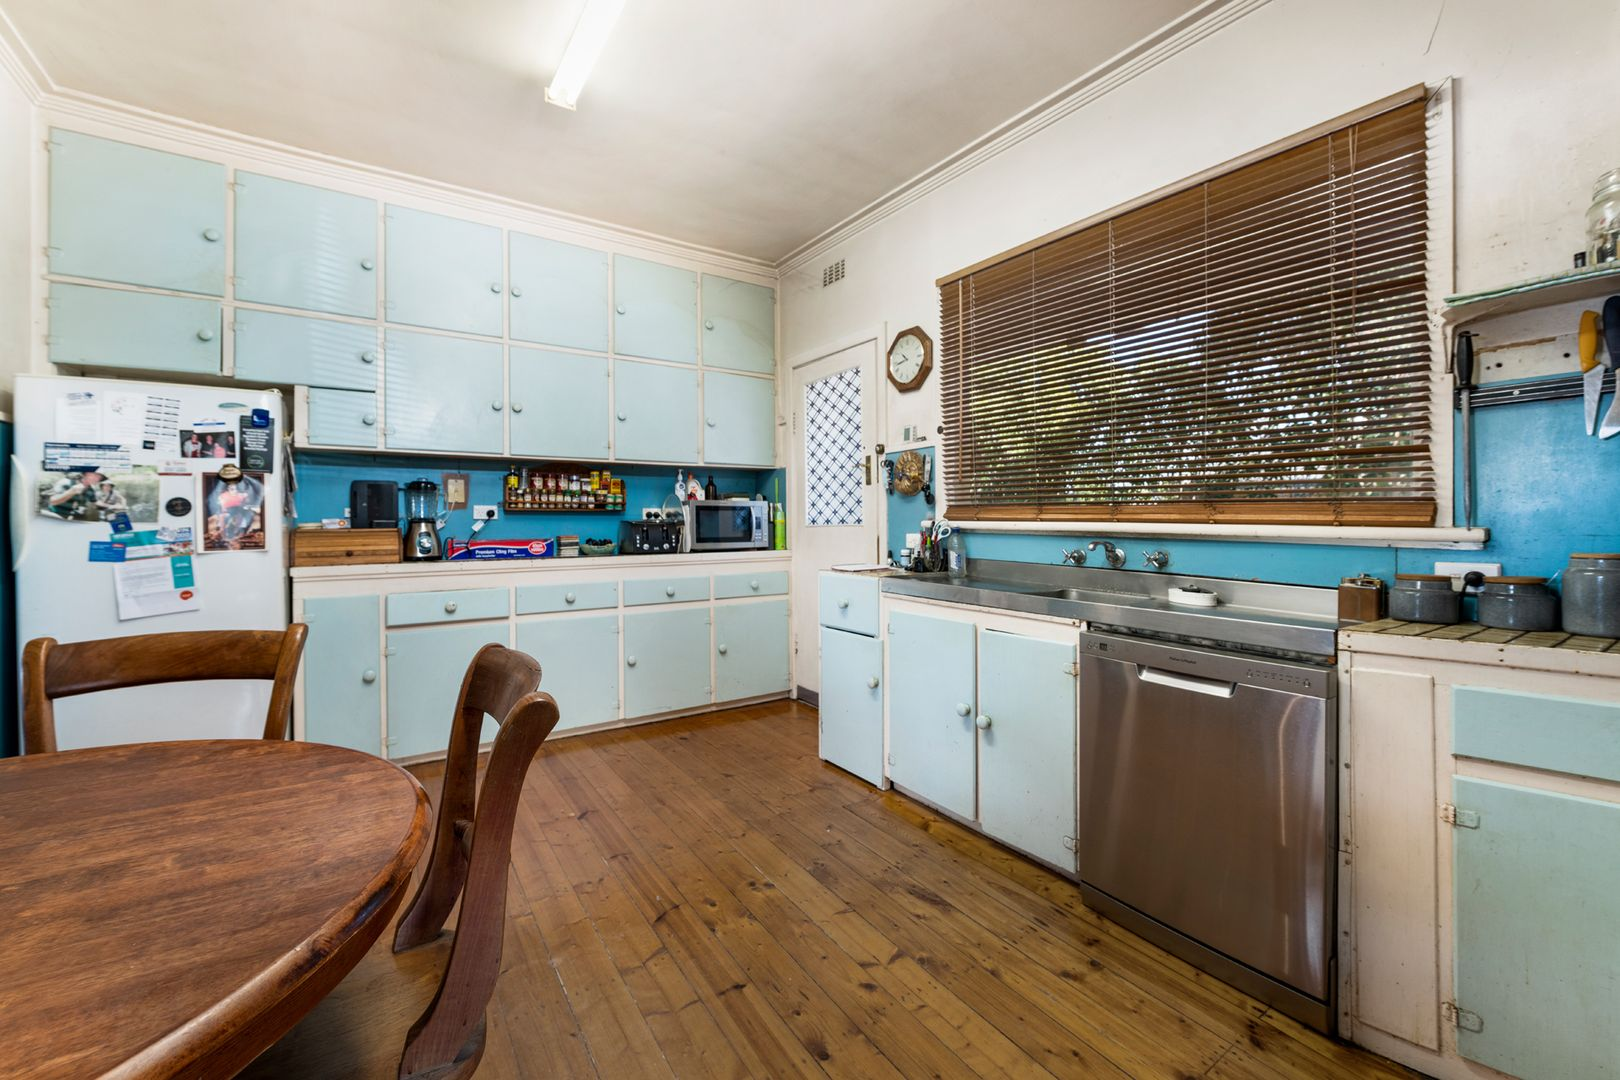 12 Dunlop Street, Wangaratta VIC 3677, Image 2